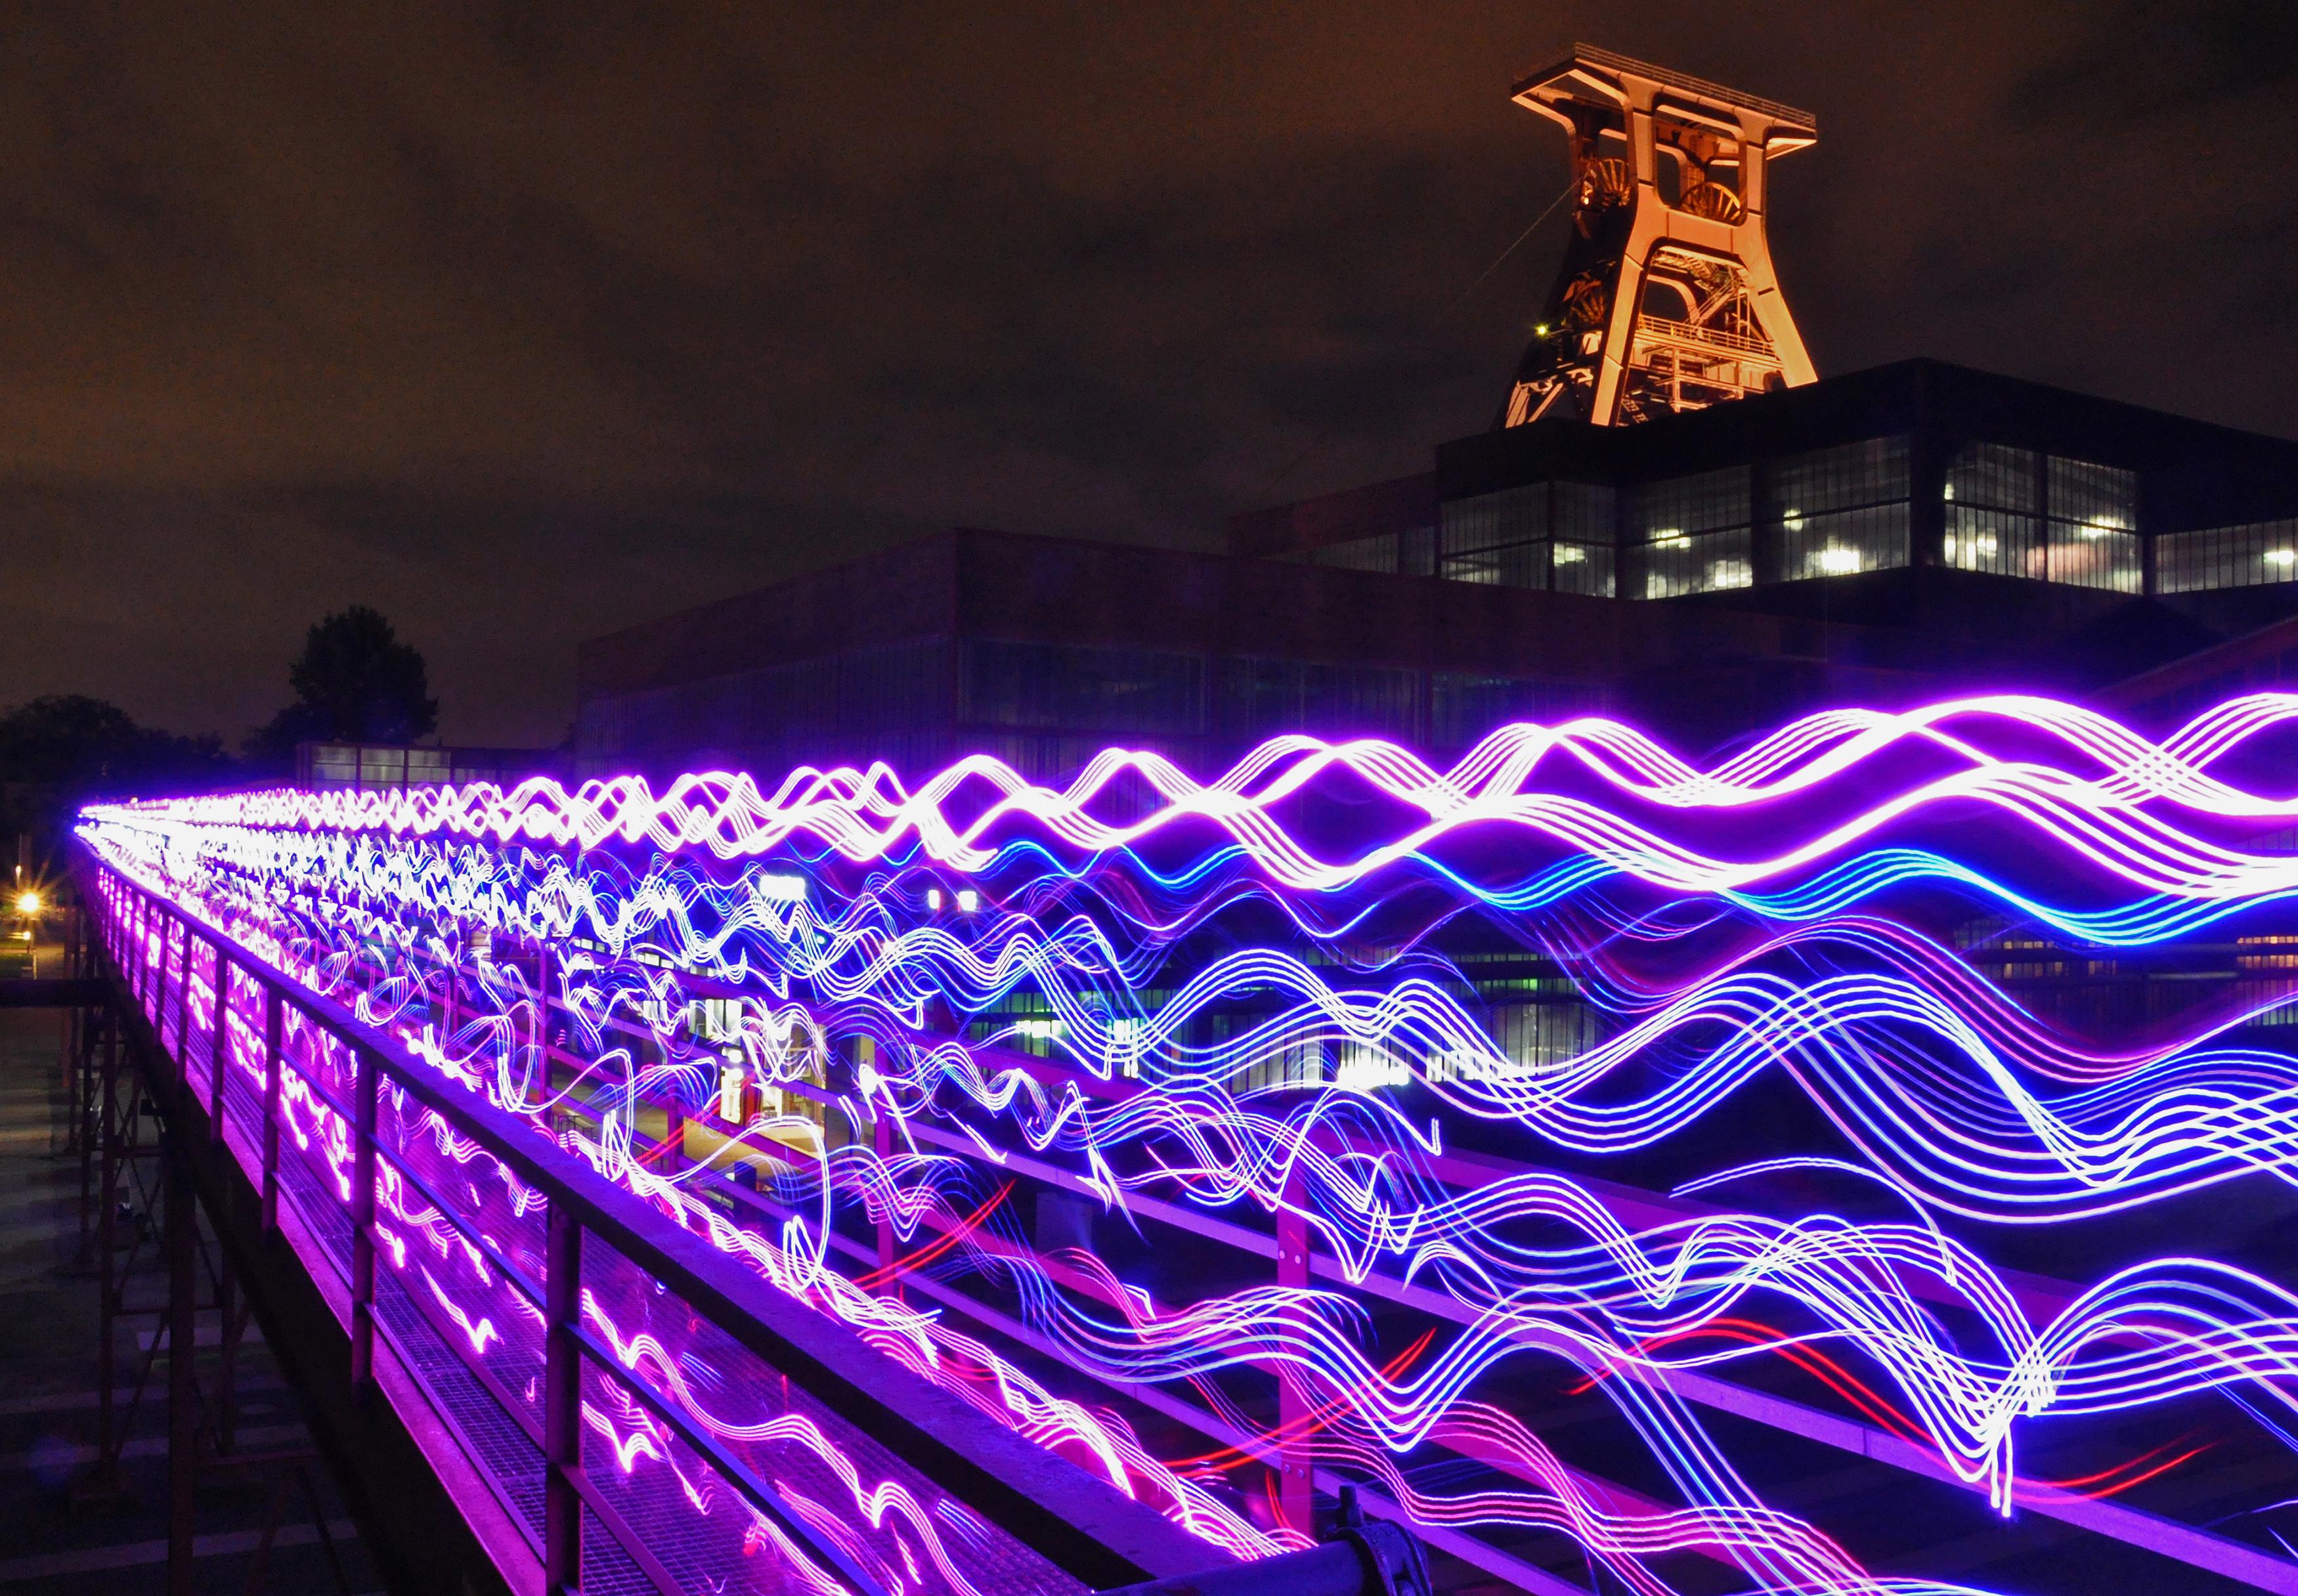 Speed of Light Run Leader RunLeader Probe Termine Bilder Fotos Ruhrgebiet Zeche NVA Blog Twitter Parken Eintritt